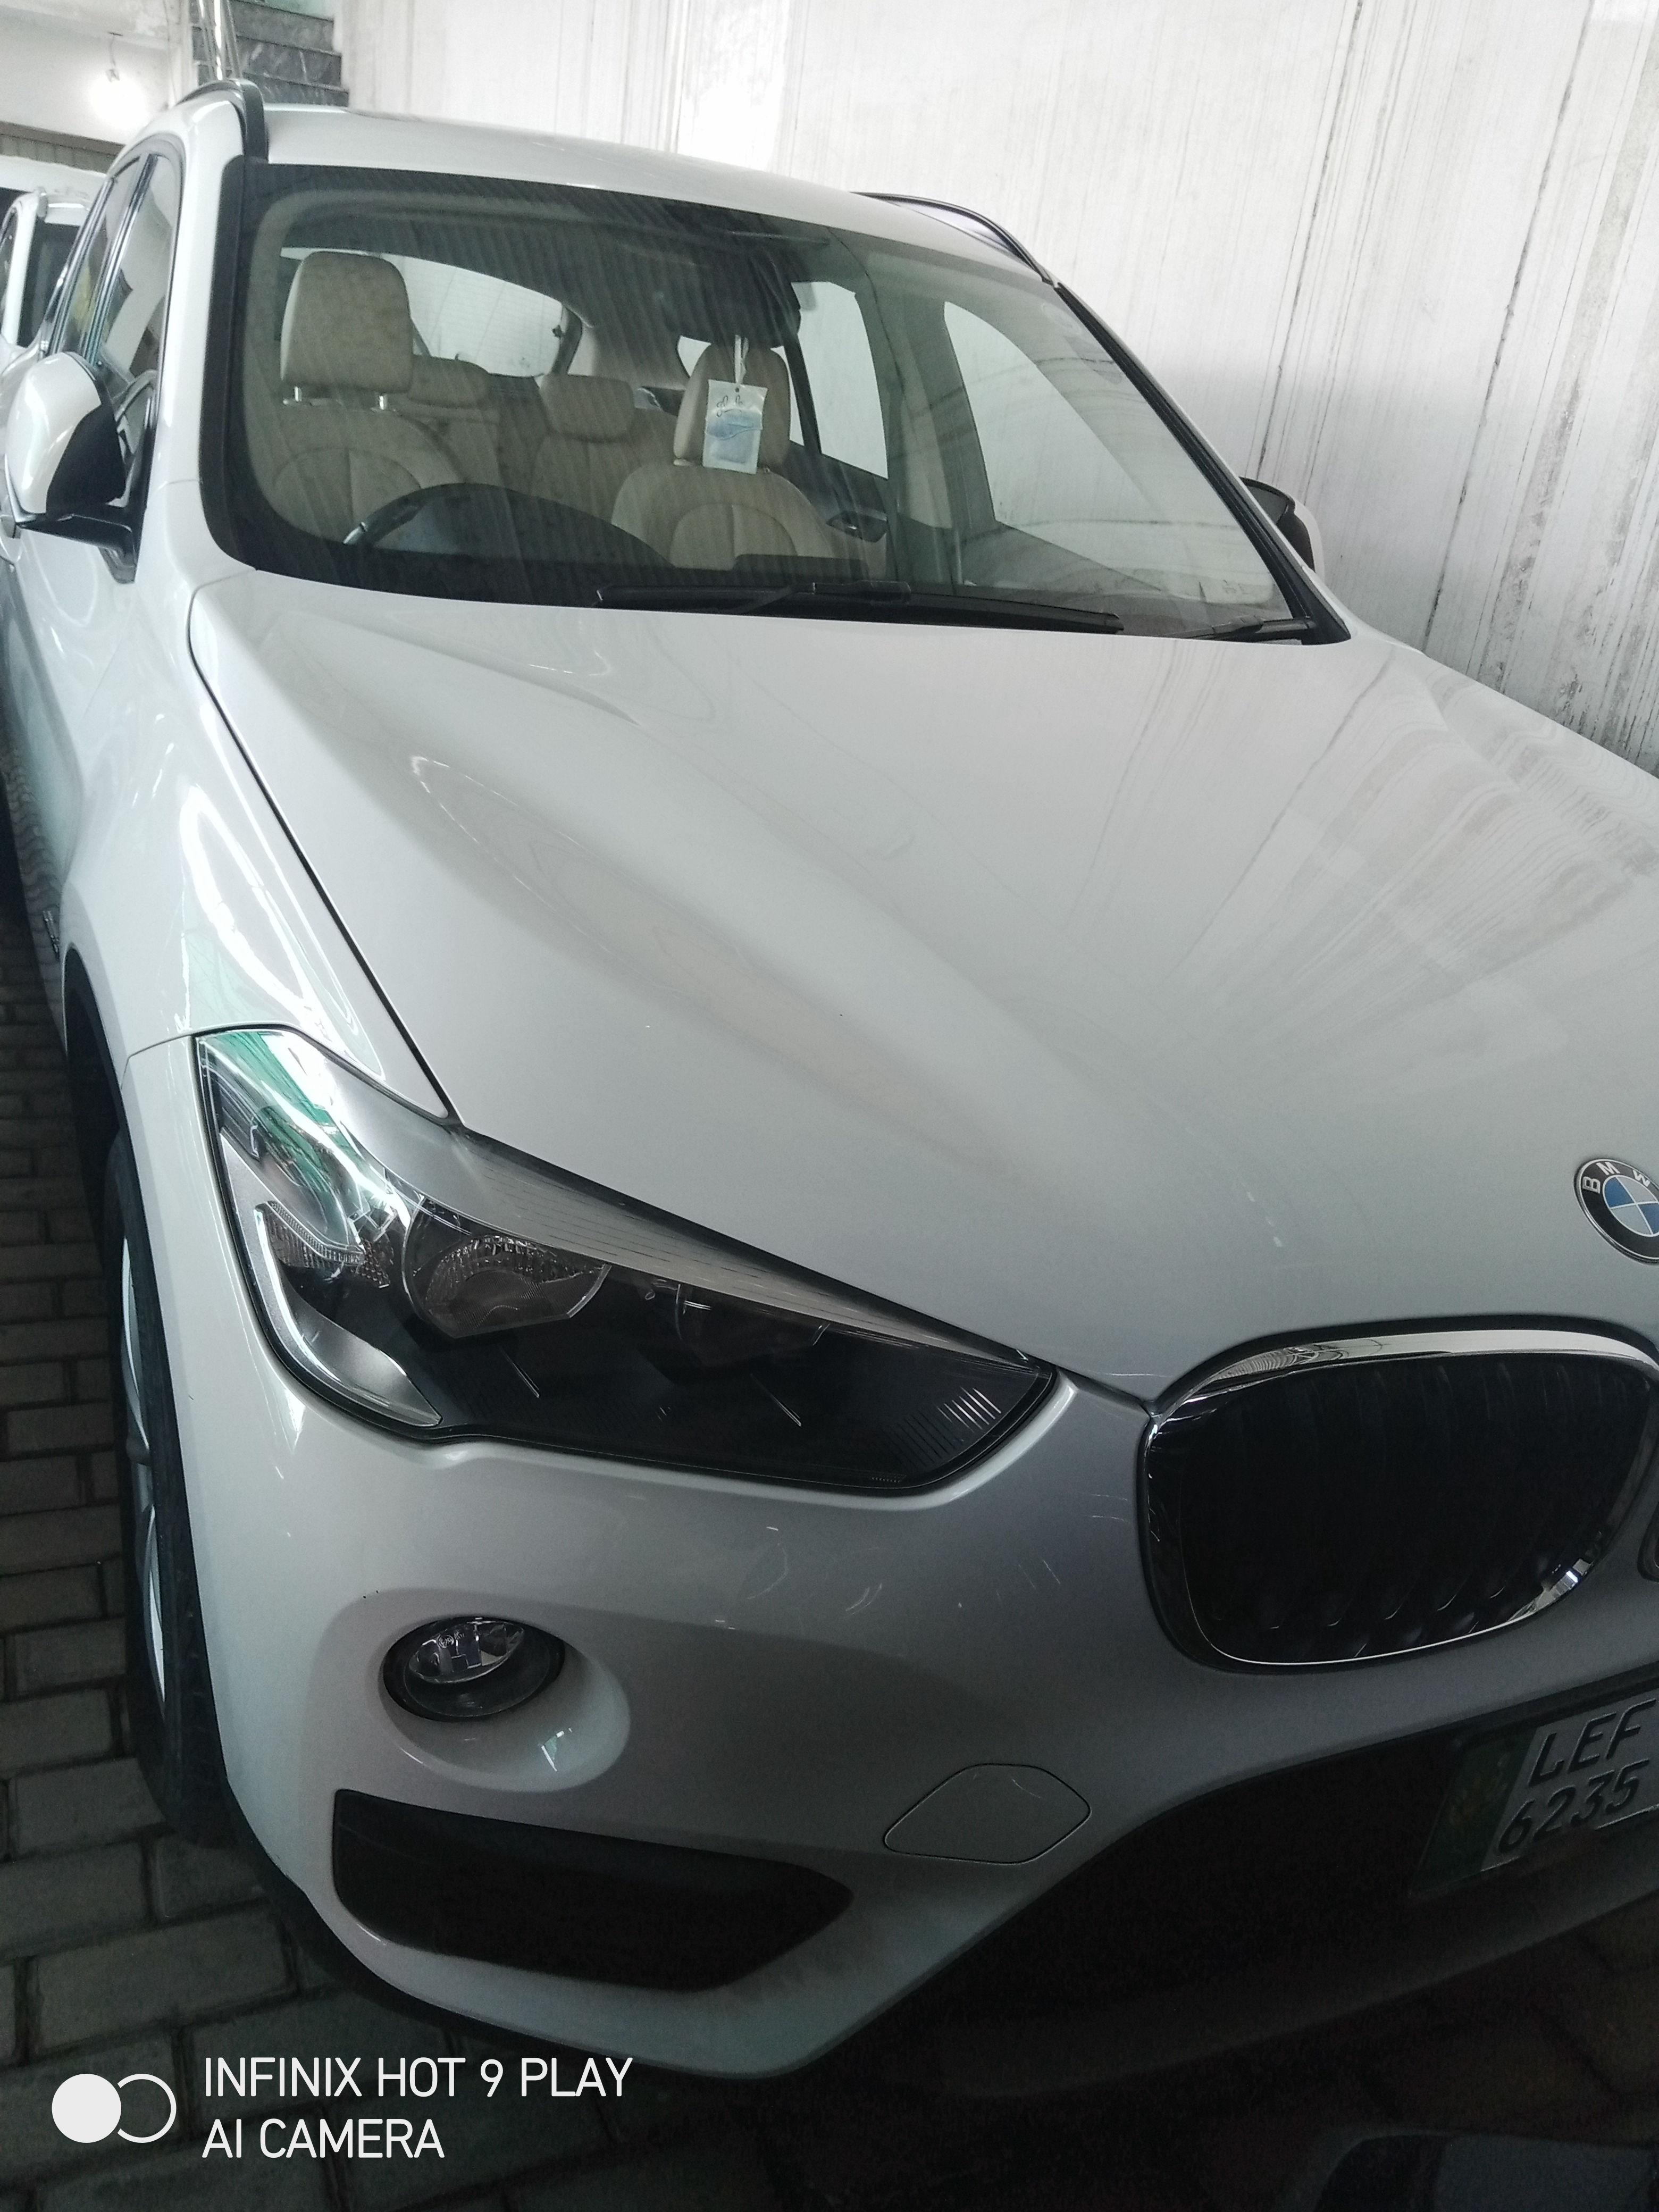 BMW X1 Fully loaded 2017